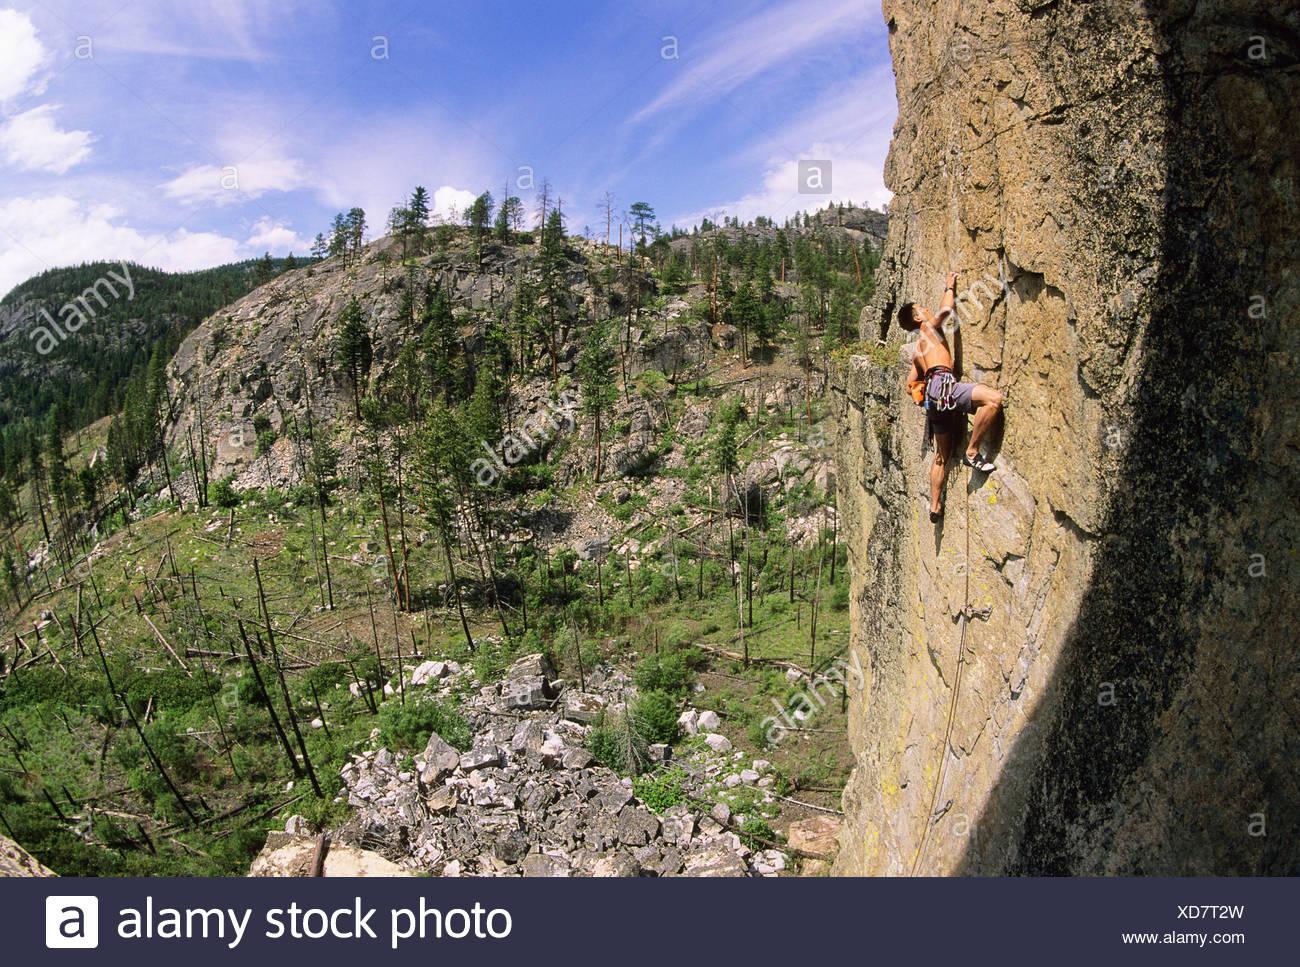 Hombre subiendo simplemente regodearse, 5.11. Diamond Back, Skaha Bluffs. Penticton, British Columbia, Canadá. Imagen De Stock